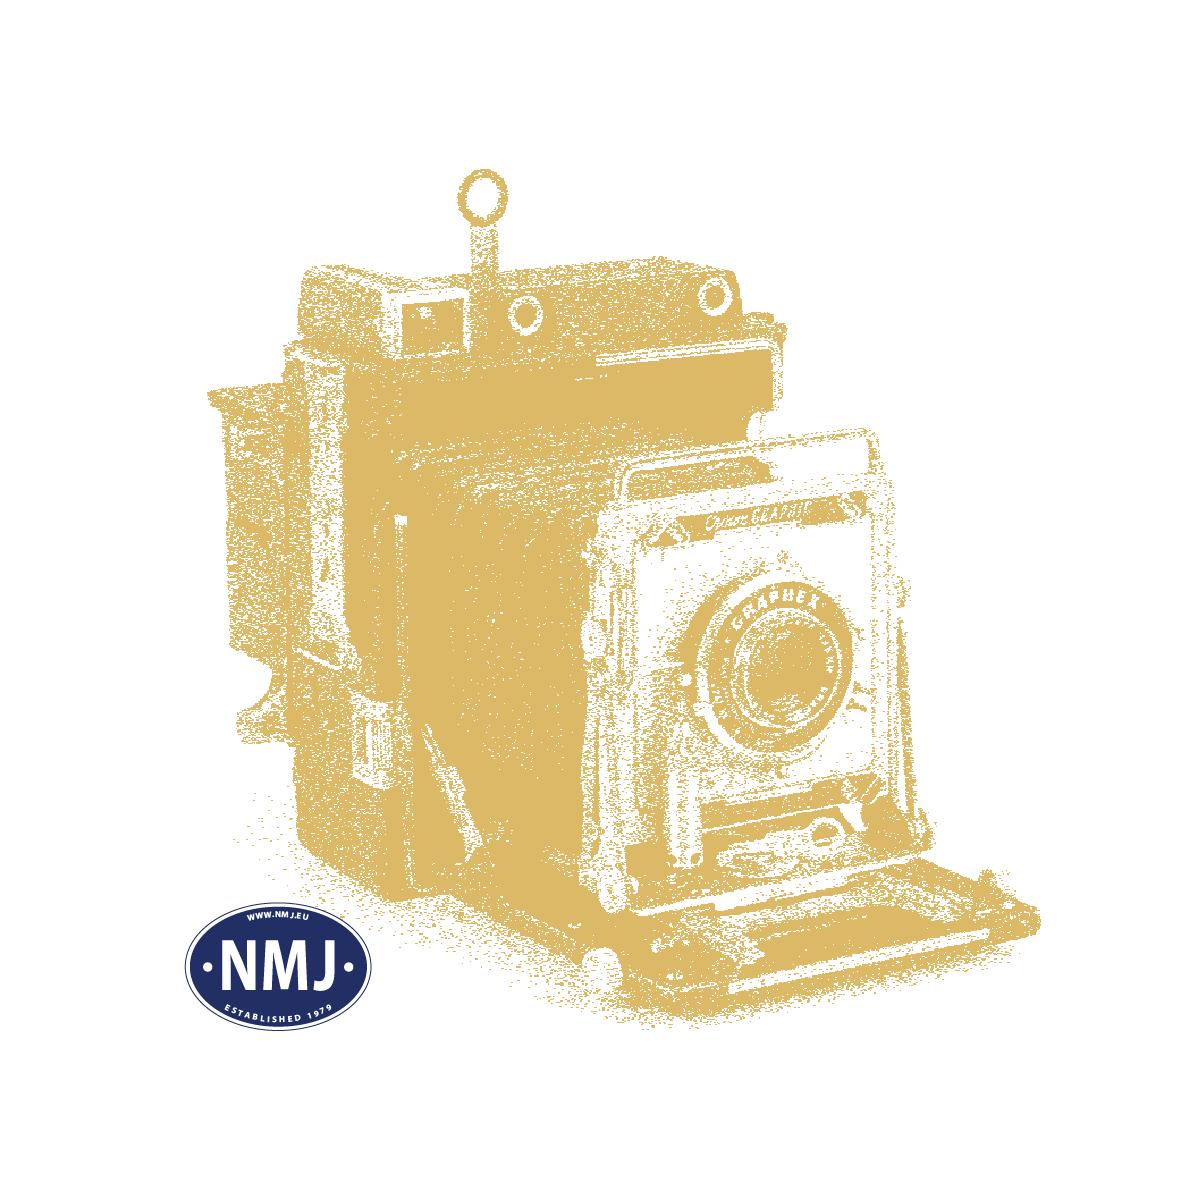 "NMJT605.301 - NMJ Topline SJ Grf 45009 ""Eve Margarin"" refrigerator car"